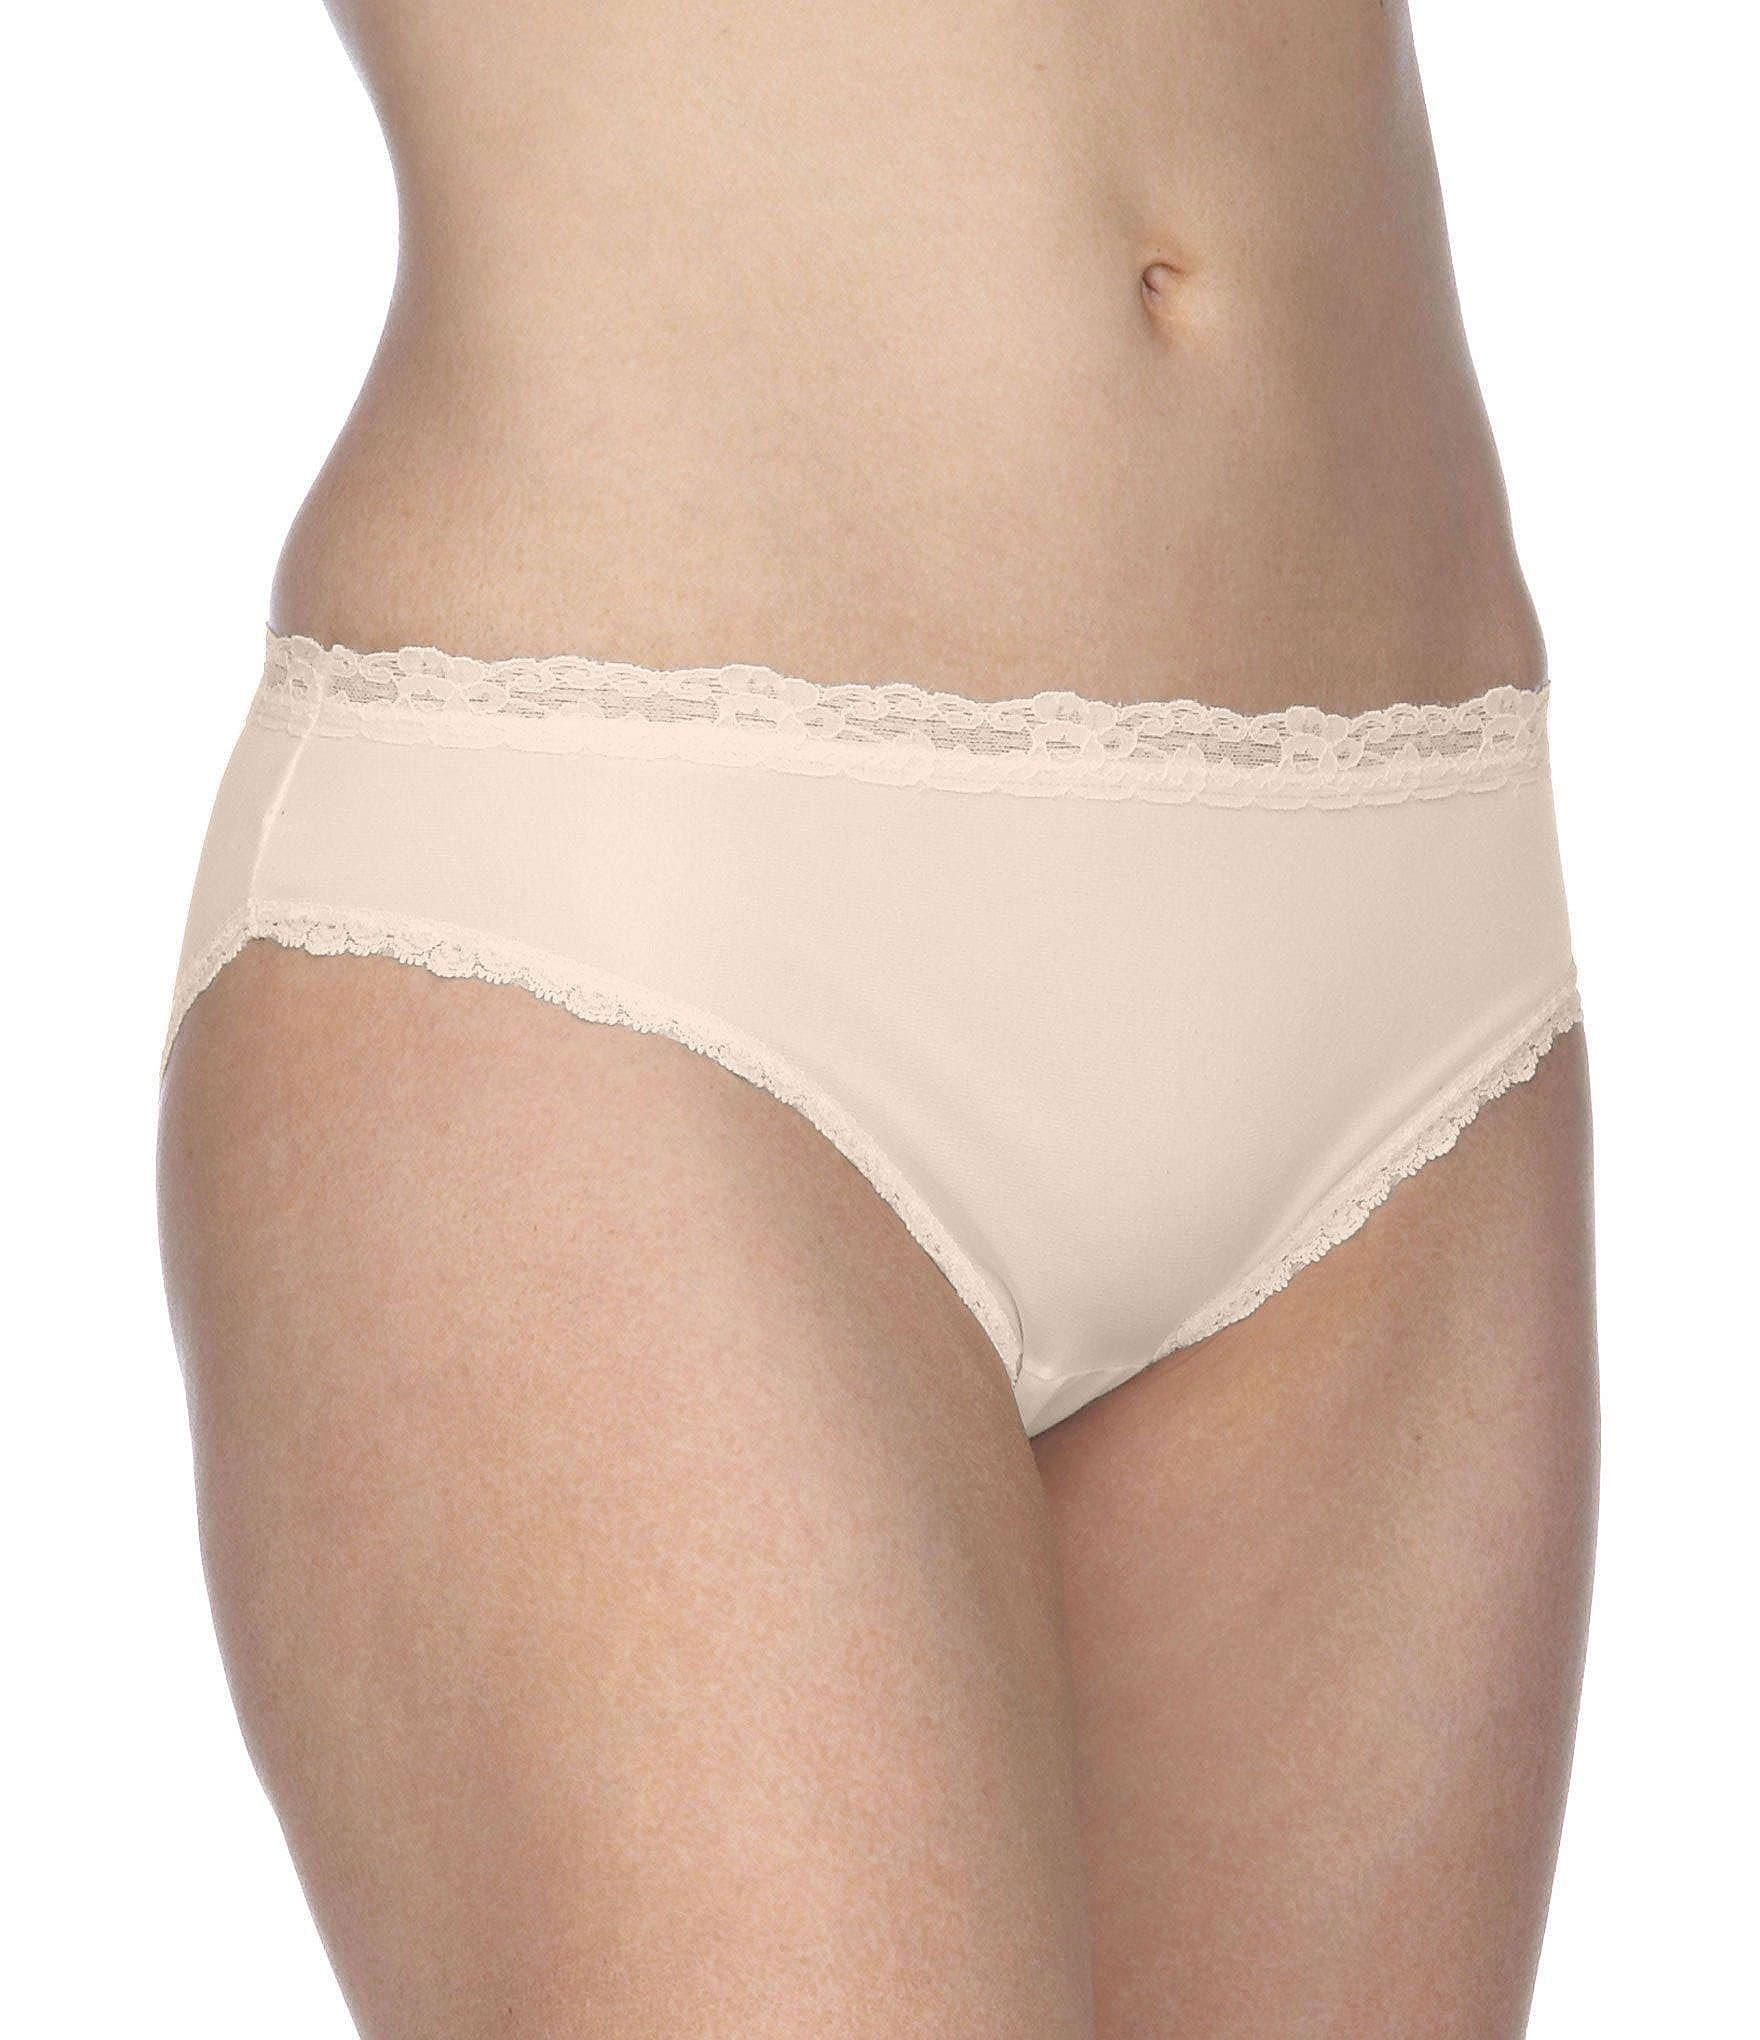 080e18e808 Cotillion Nylon Lace-Trim Bikini Panty